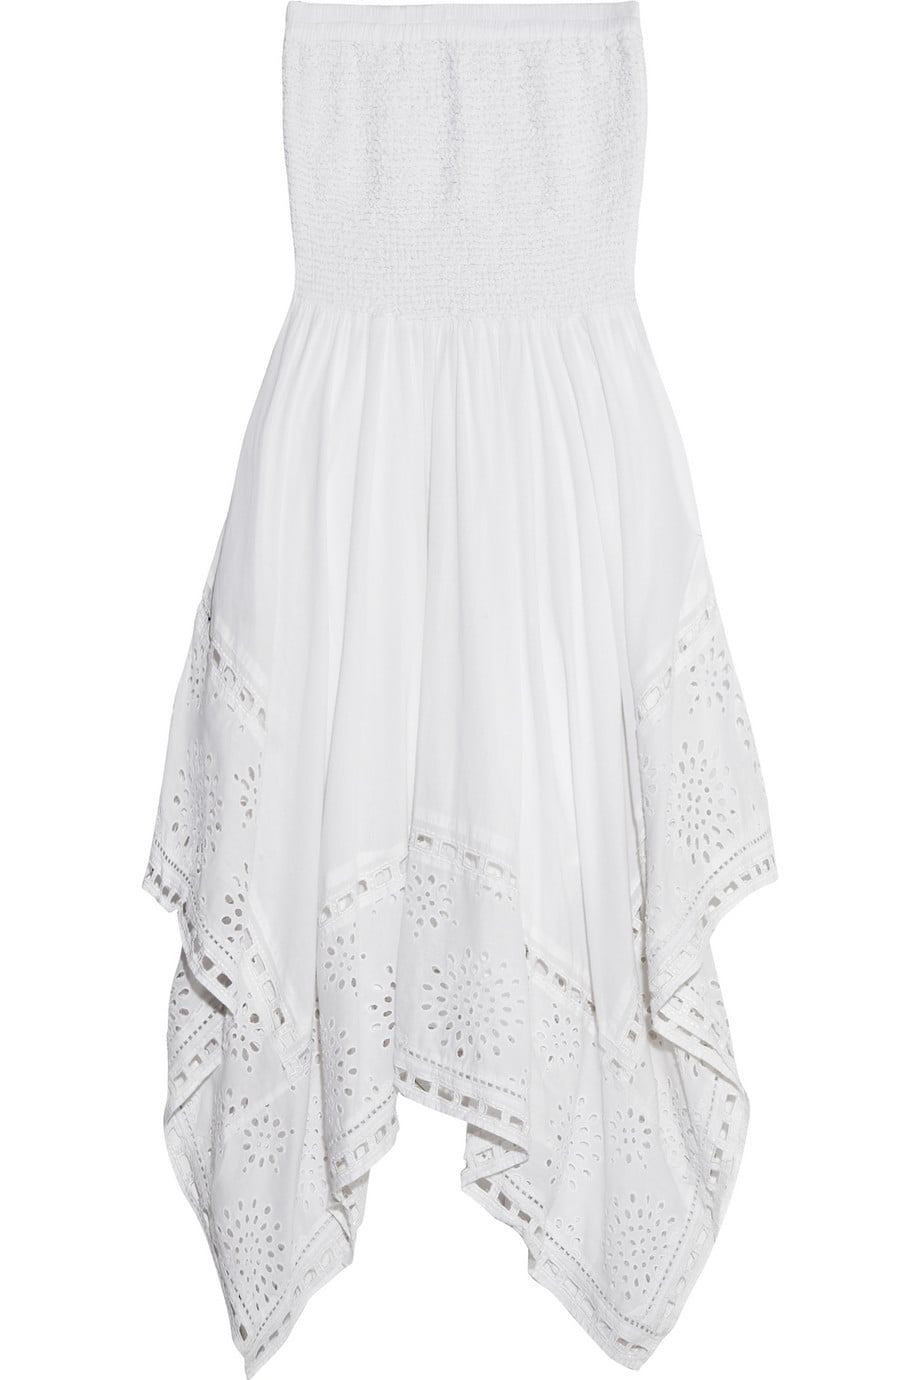 Michael Michael Kors White Strapless Dress